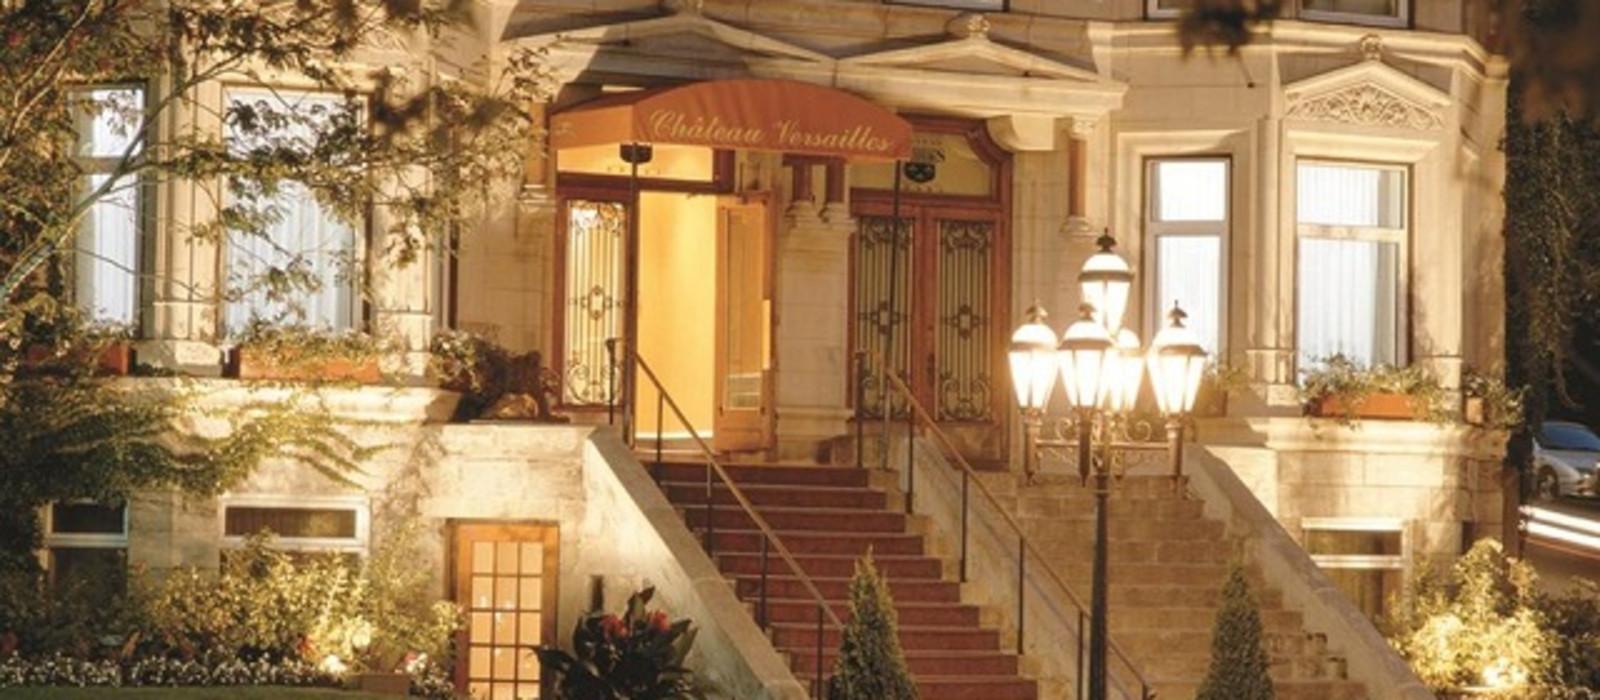 Hotel Chateau Versailles Kanada